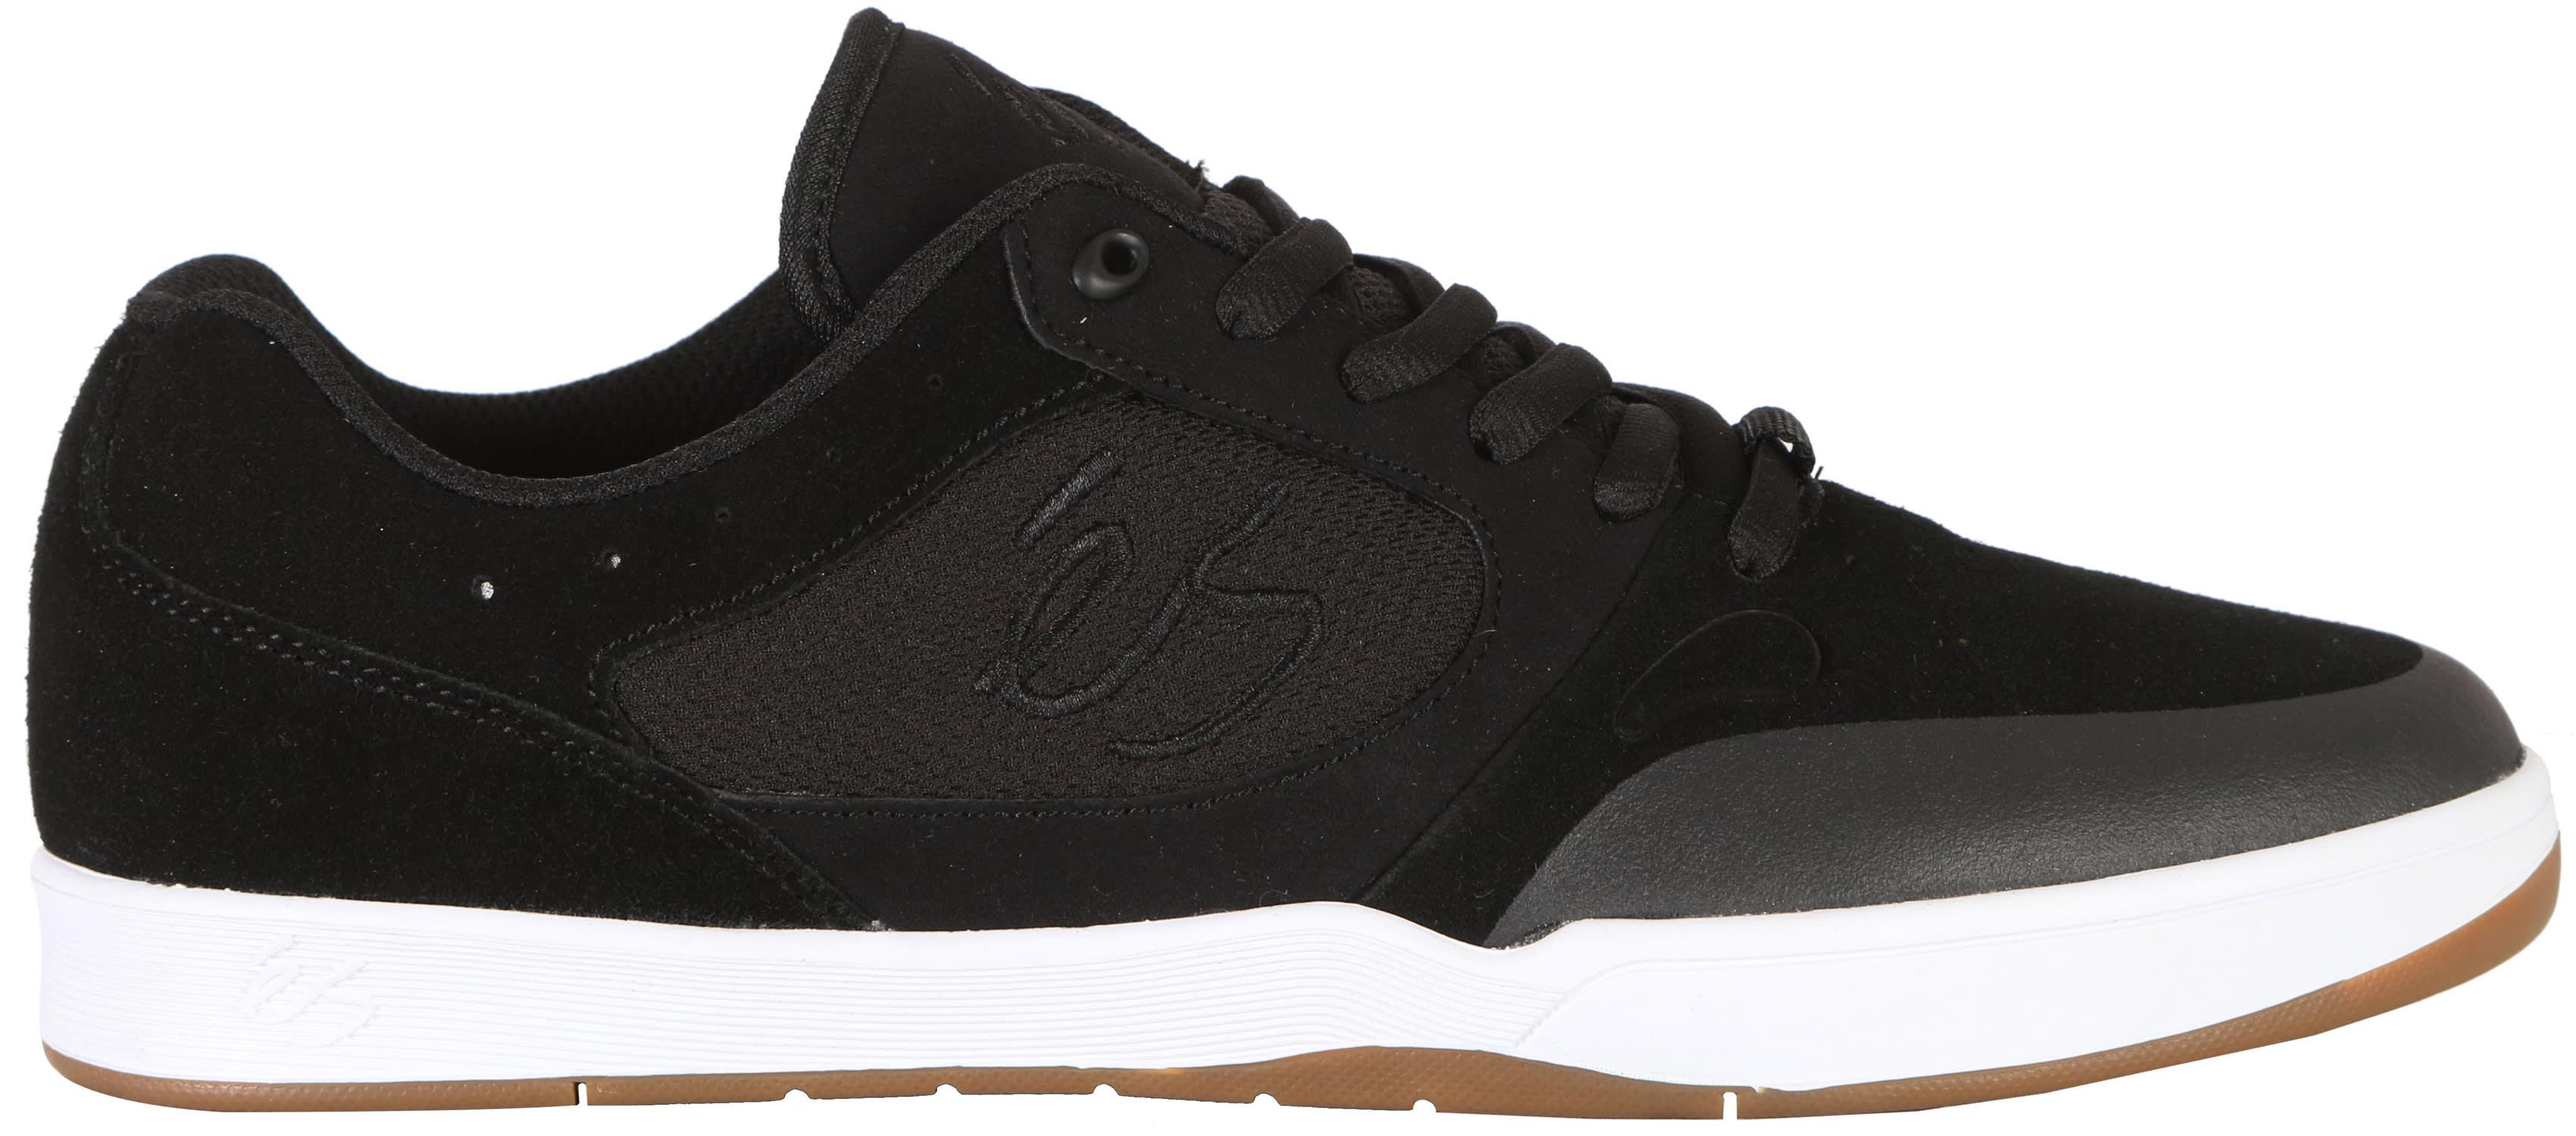 Es Swift 1 5 Skate Shoes